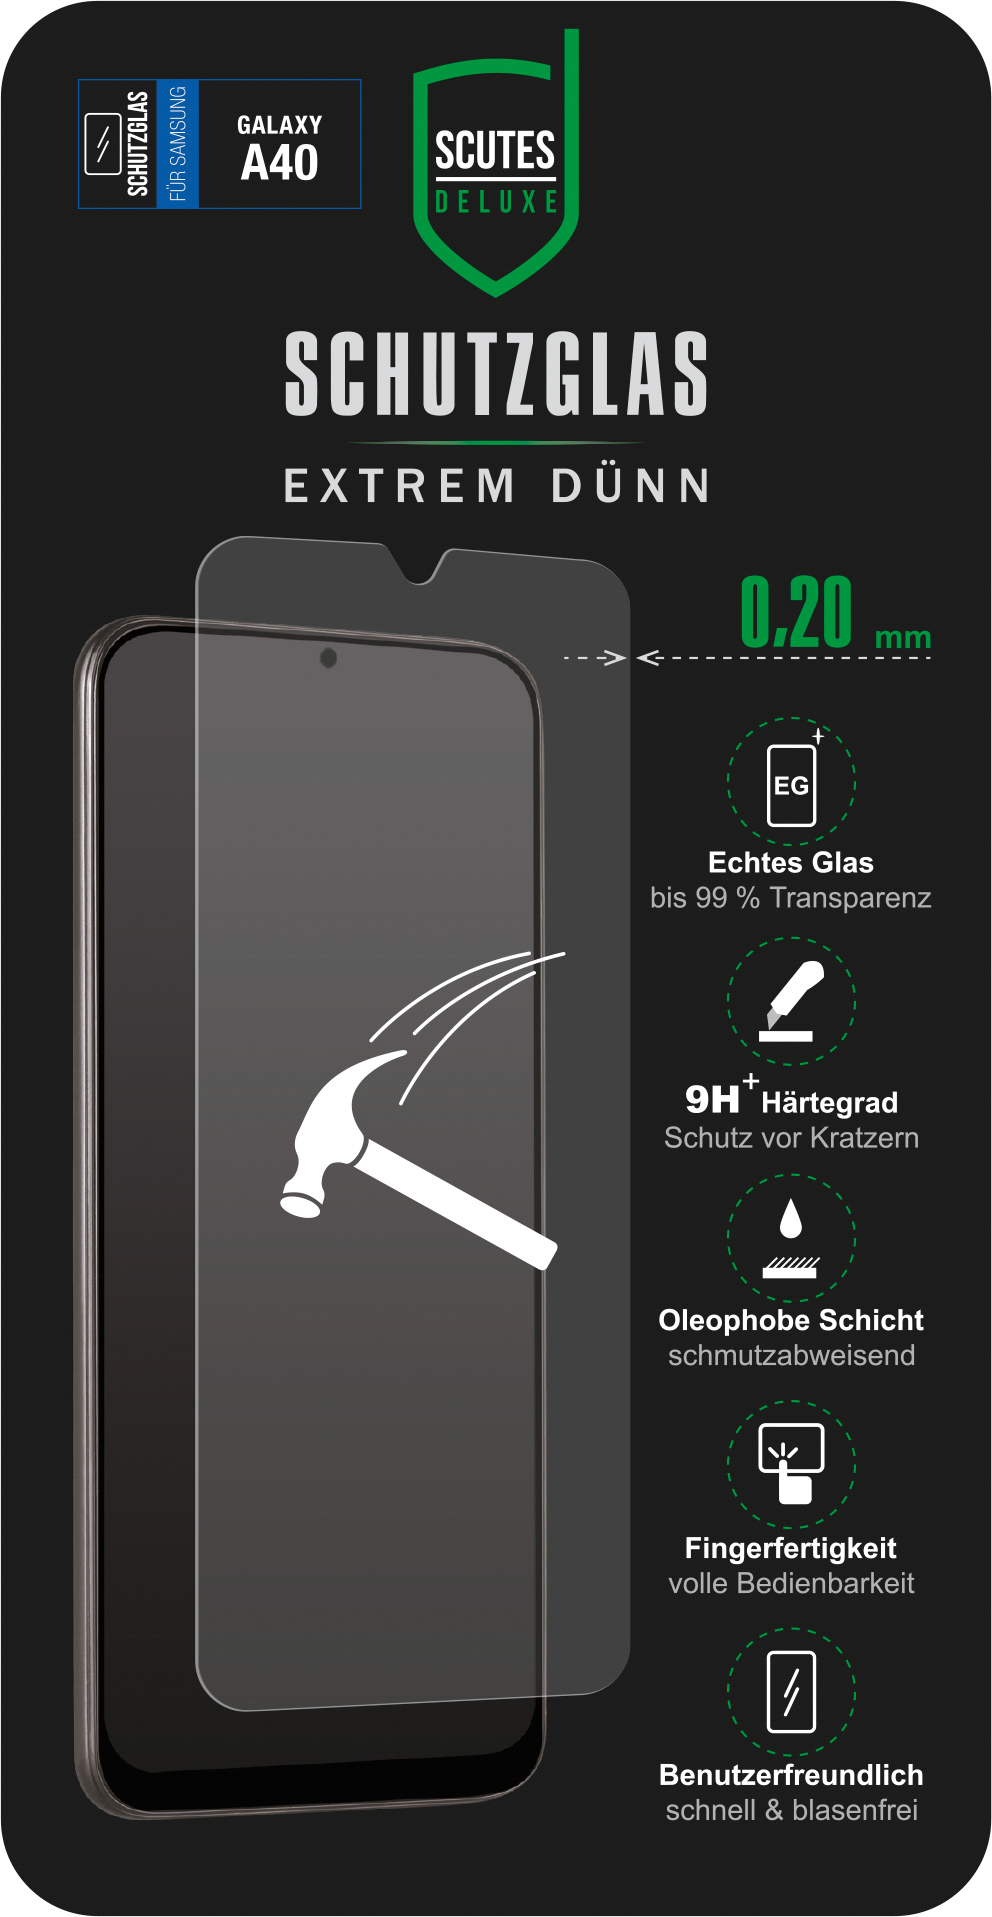 Schutzglas (Samsung Galaxy A40)